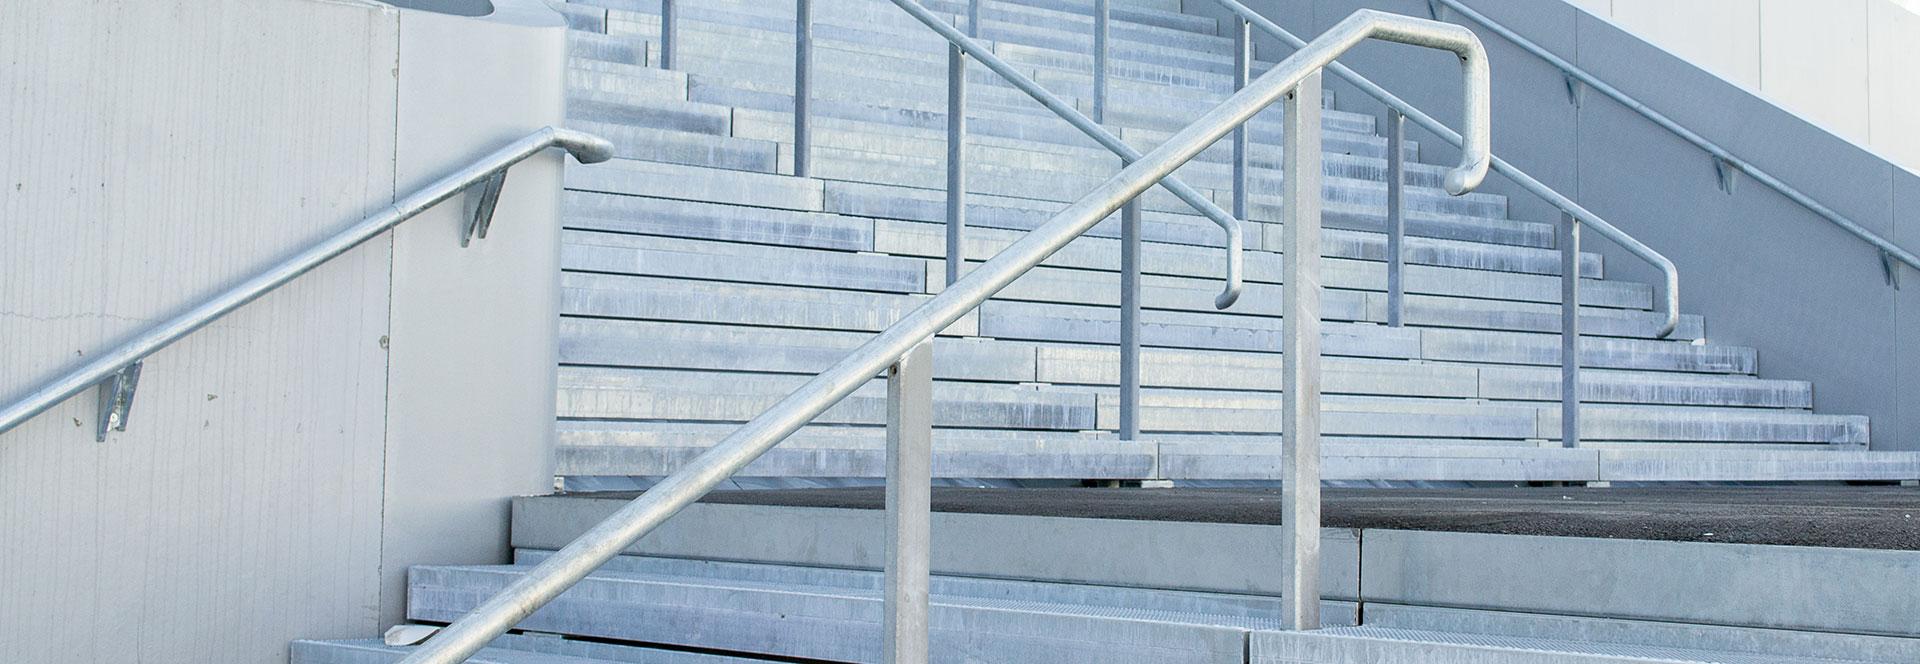 MEA Metal Applications - Referenzen Allianz Arena München